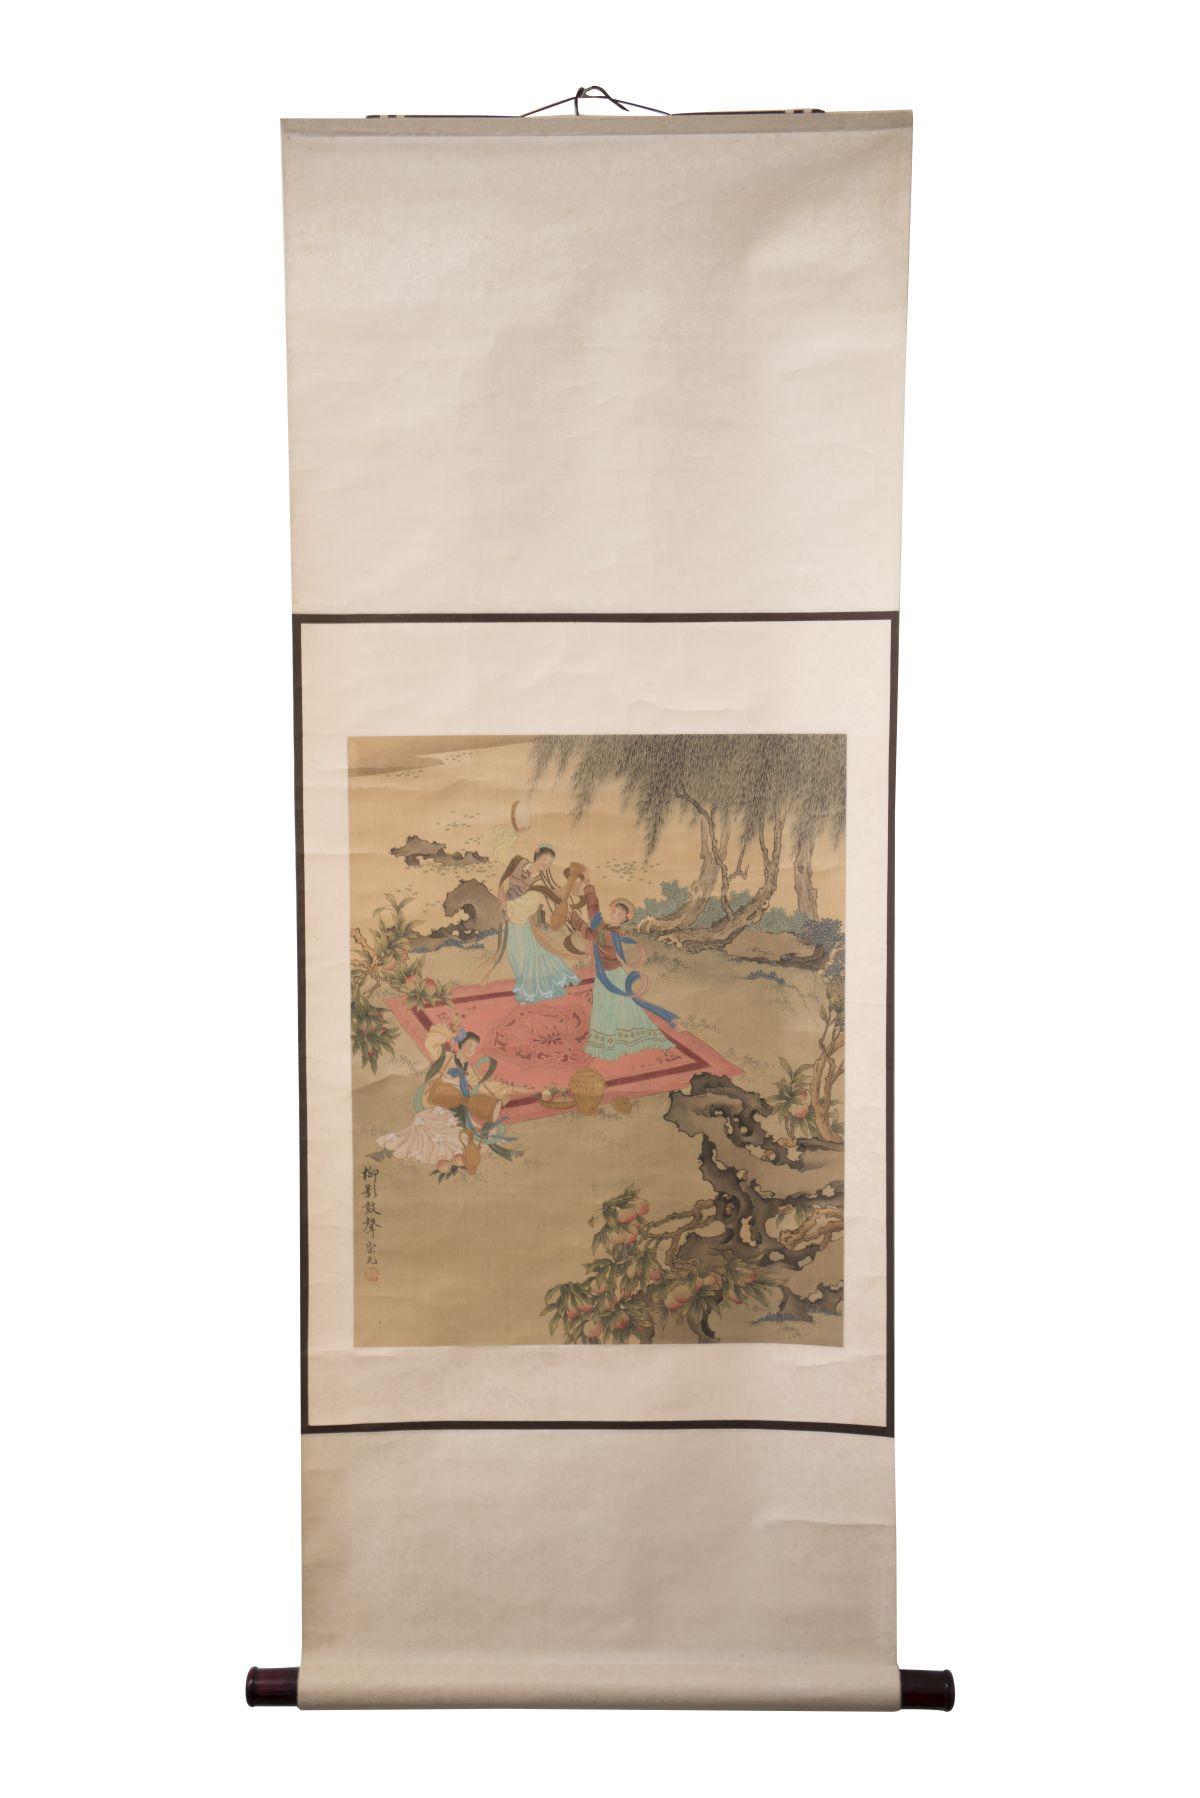 #84 Japanese hanging scroll | Japanische Hängerolle Image